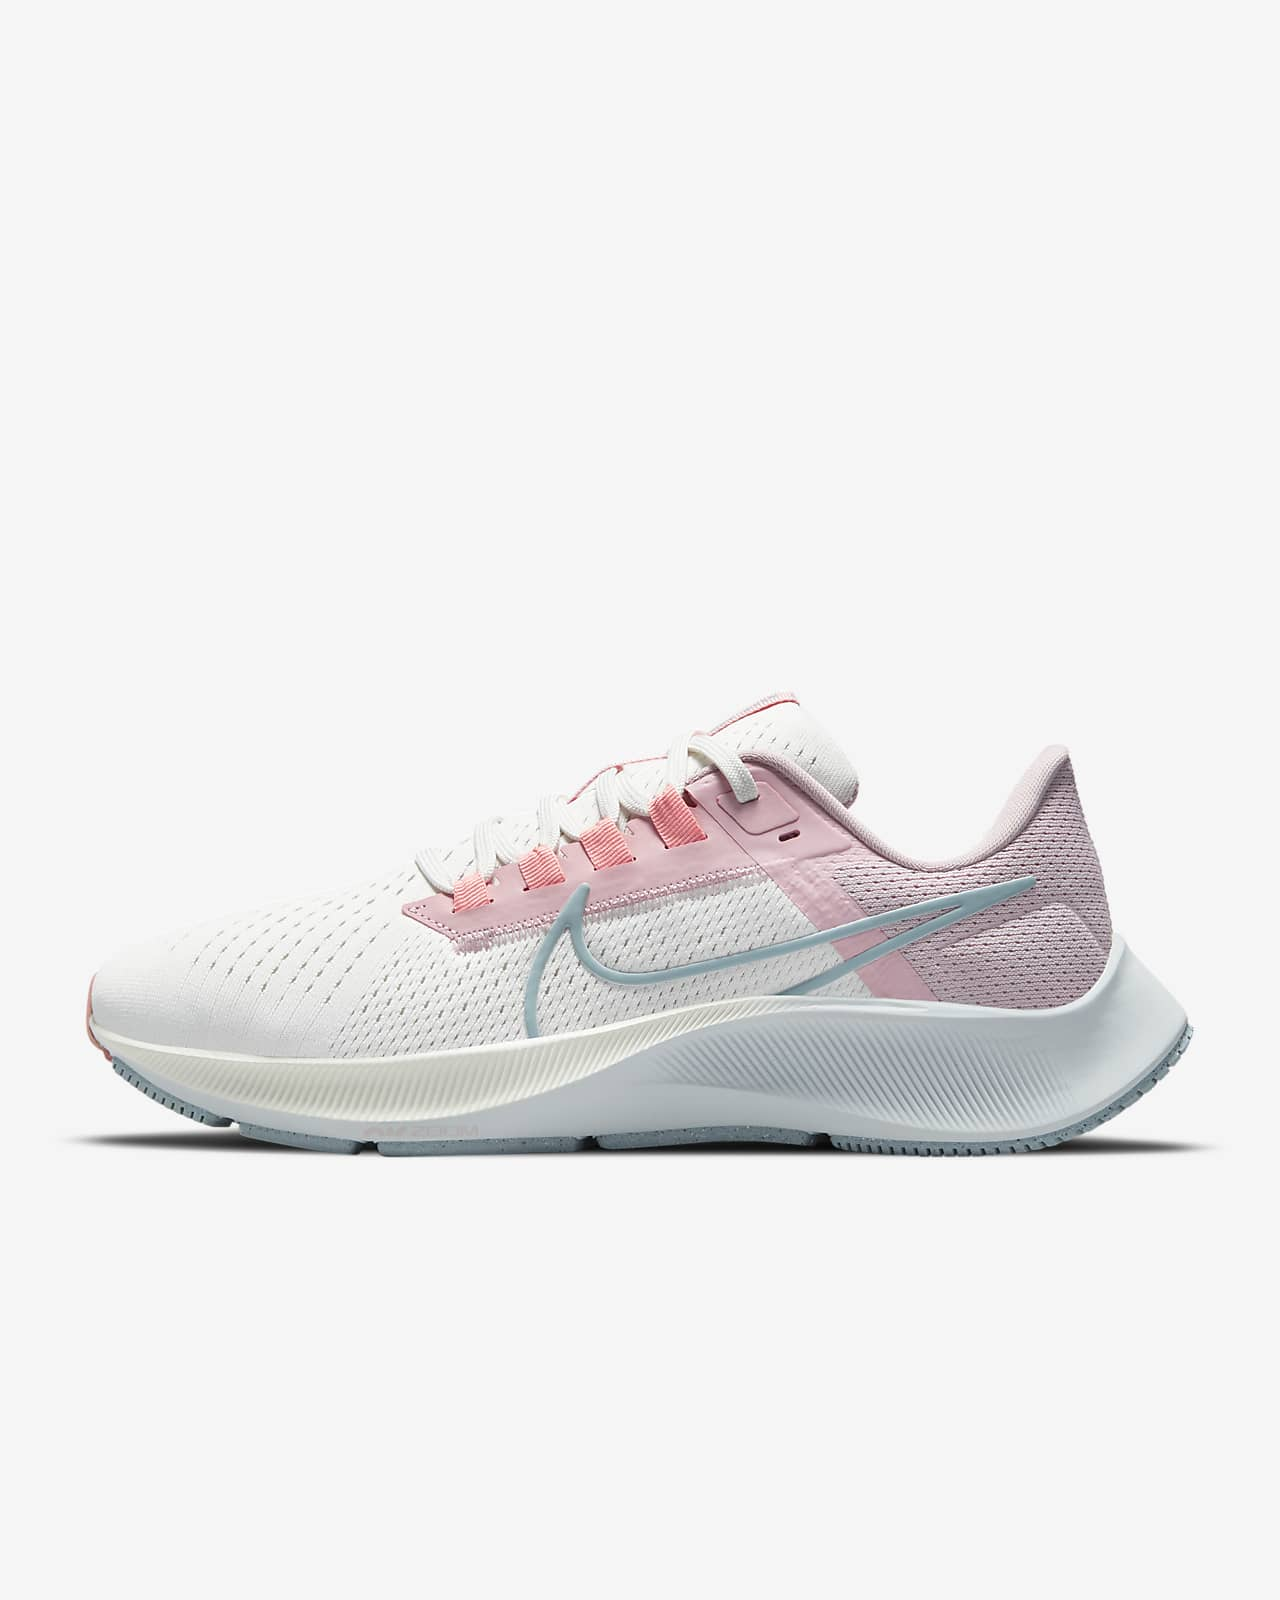 Dámské běžecké silniční boty Nike Air Zoom Pegasus38